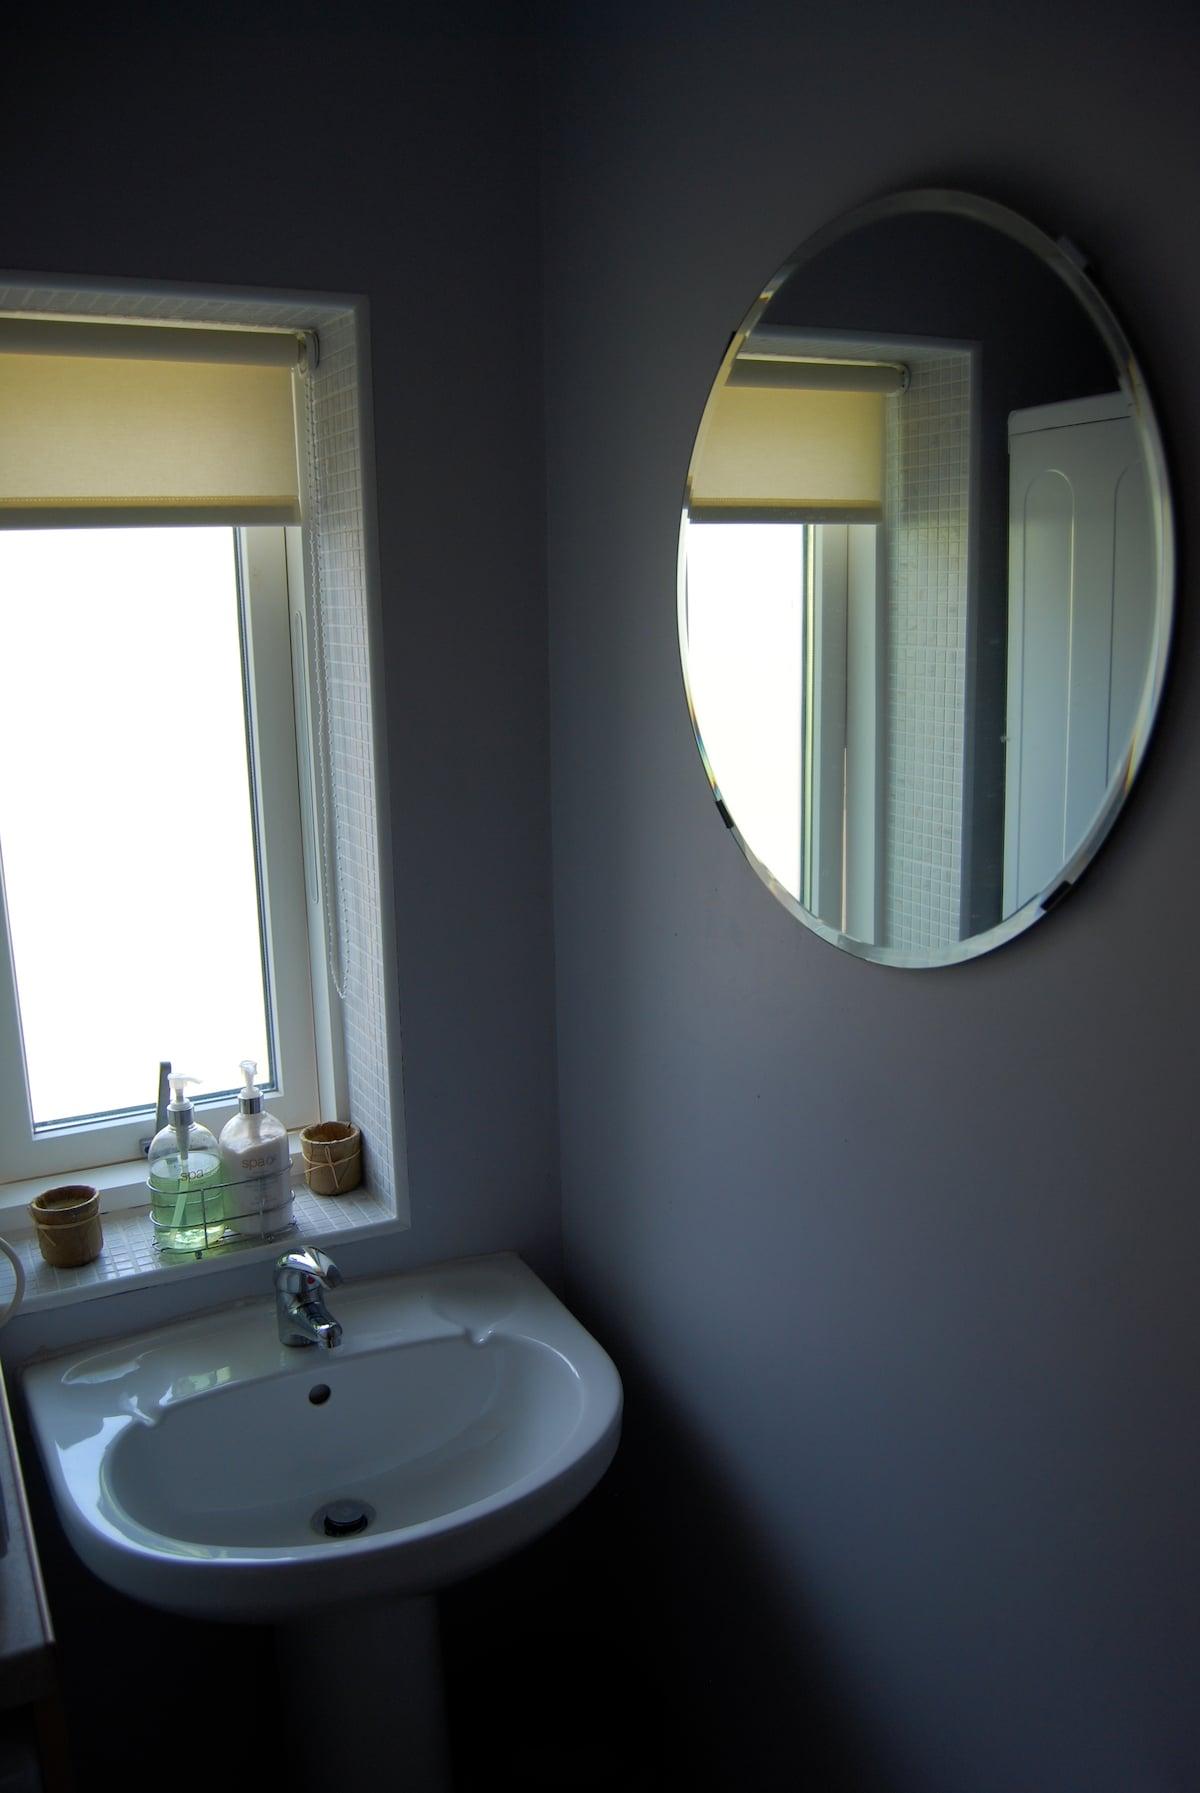 Bathroom/shower area